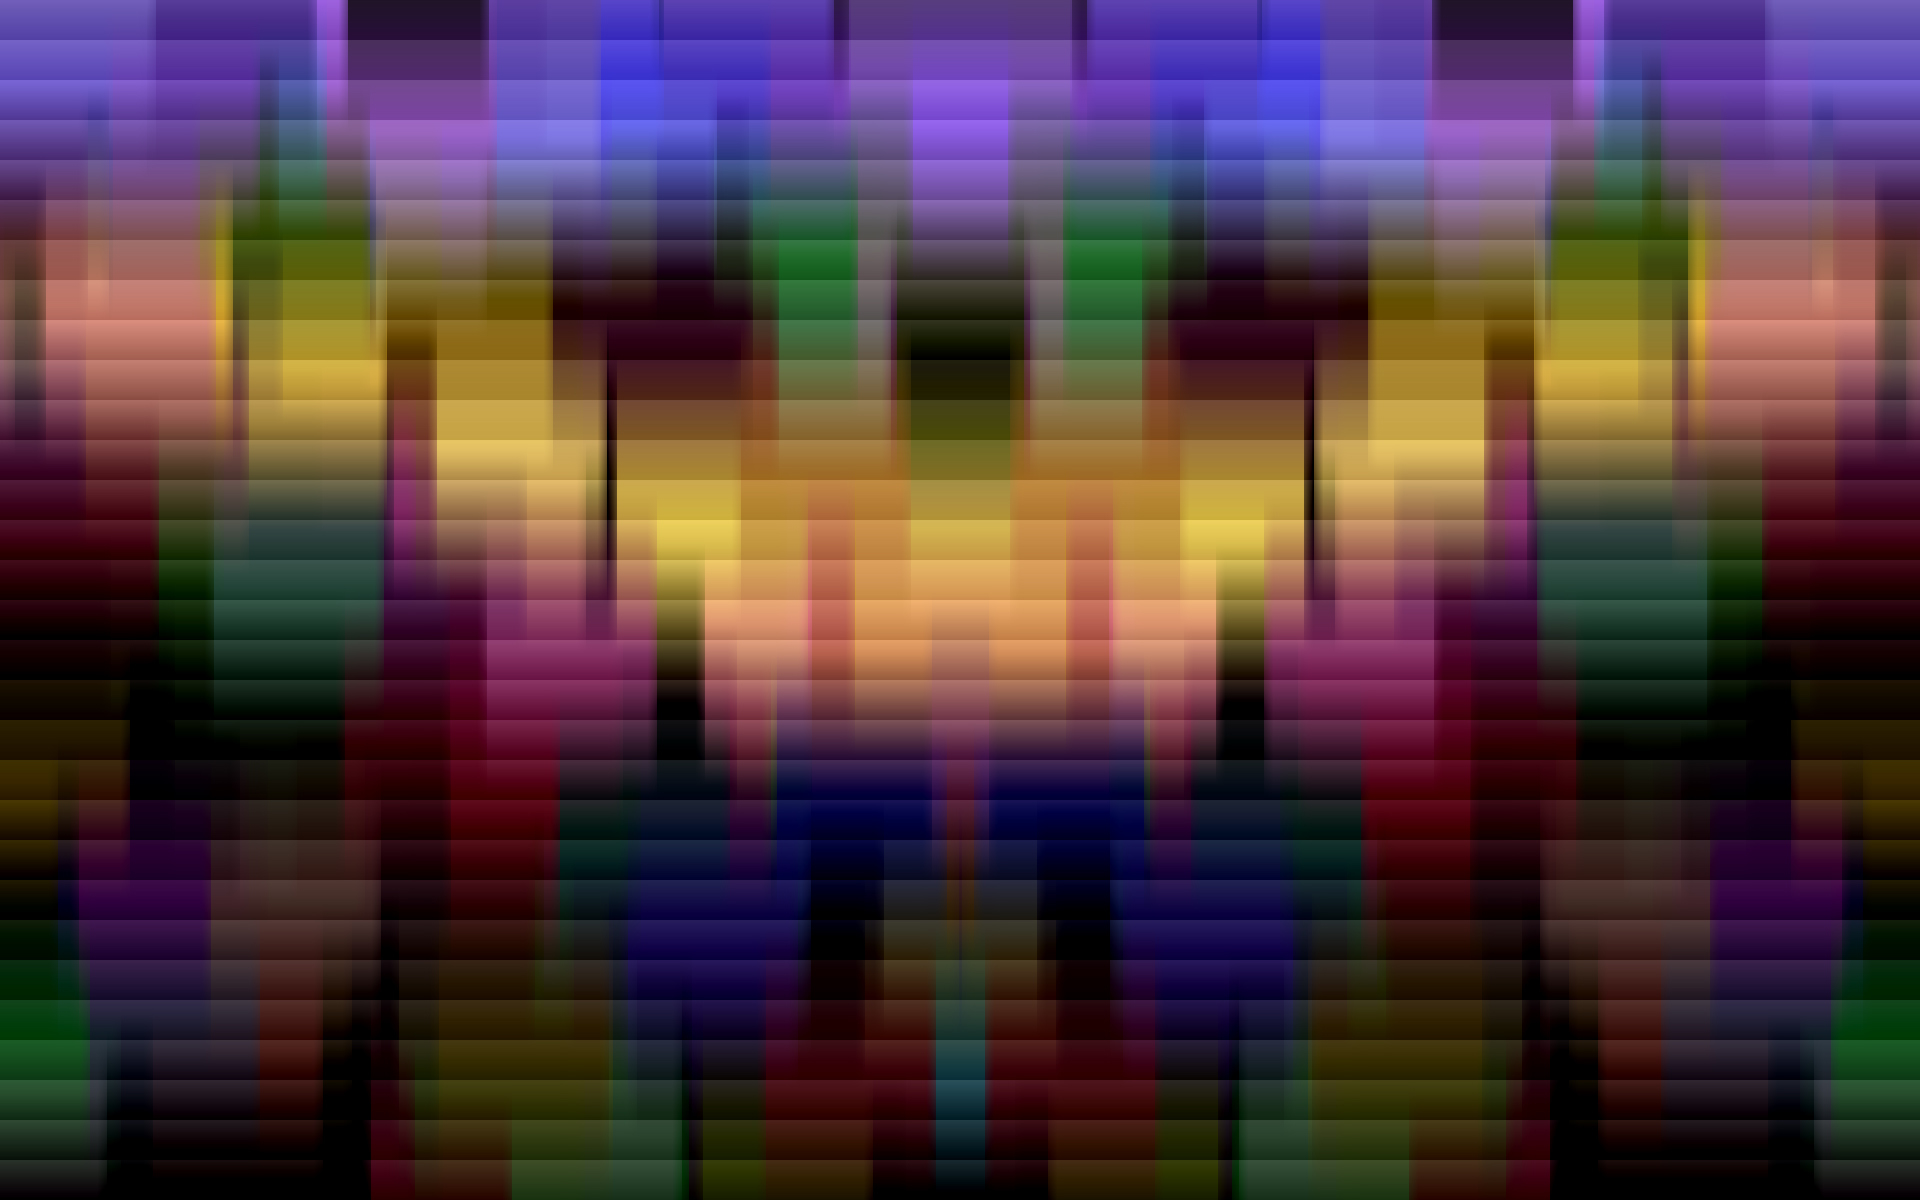 Image for colorful squares digital art hd wallpaper 1920×1200 29496